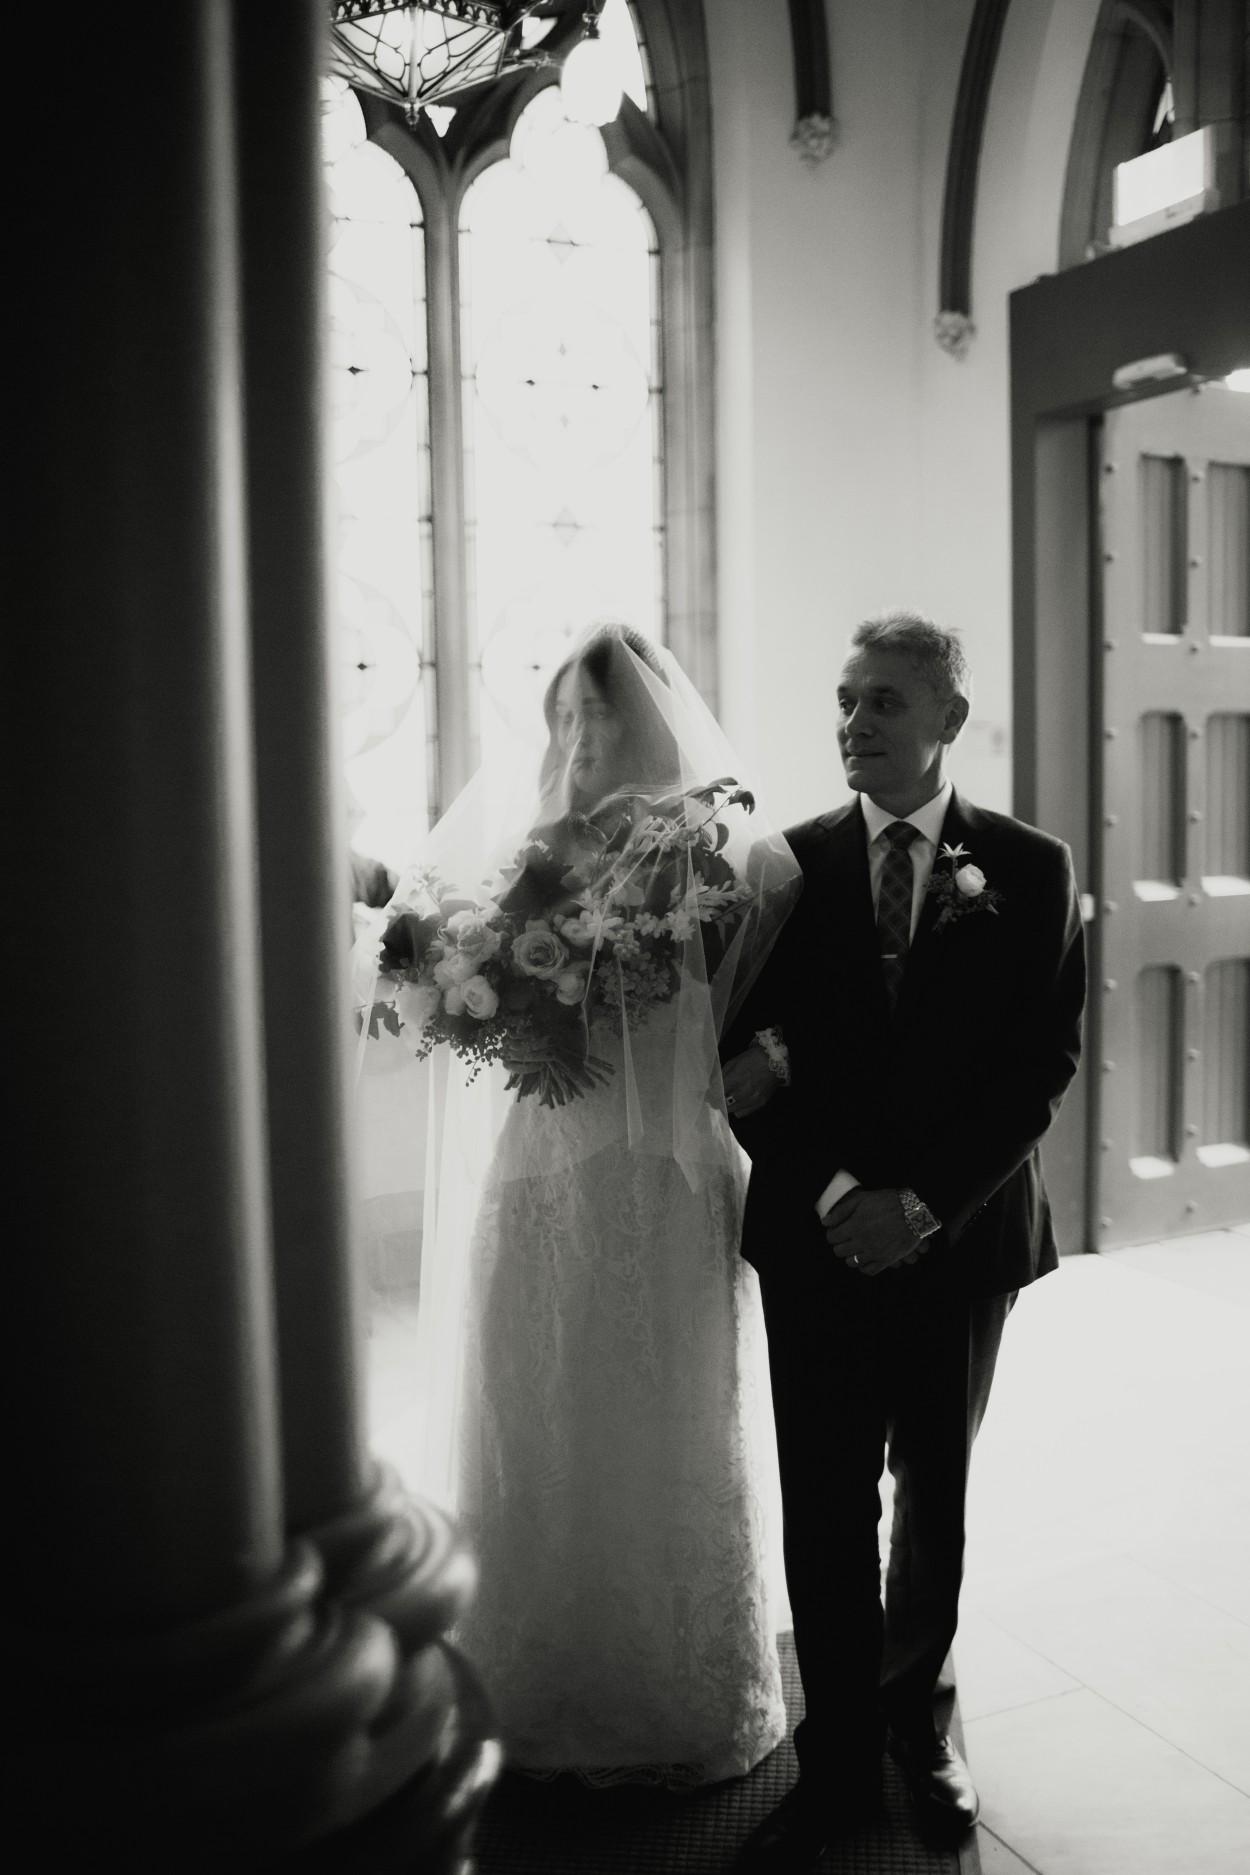 I-Got-You-Babe-Weddings-The-023George-Ballroom-St-Kilda-Wedding-Amy-Abhi.jpg